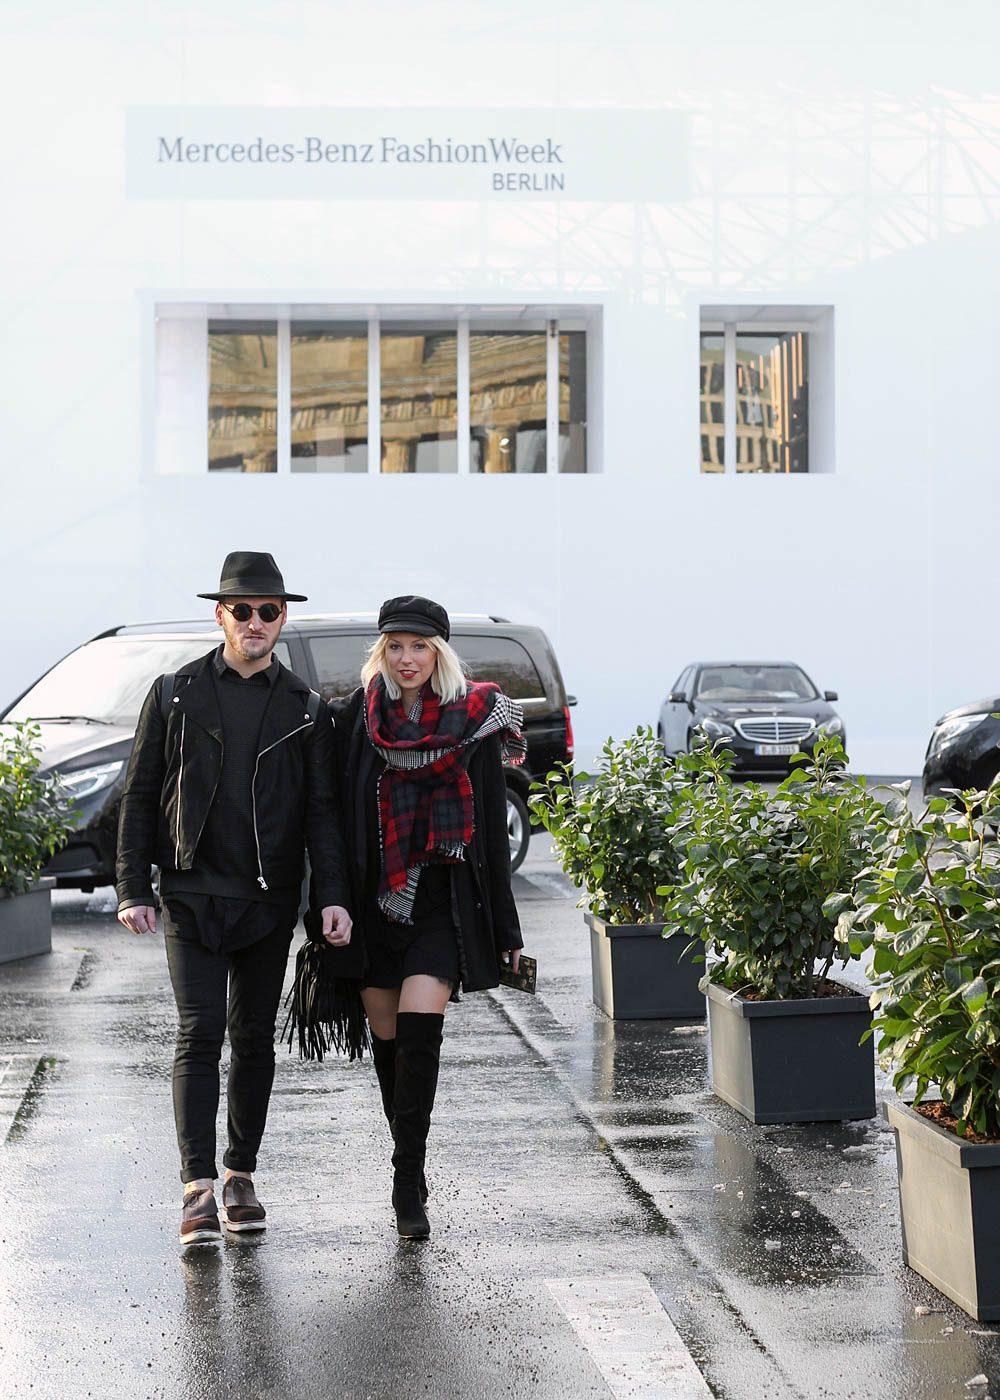 fashionblogger-outfit-fashion-week-berlin-januar-2016-mbfw-2-2